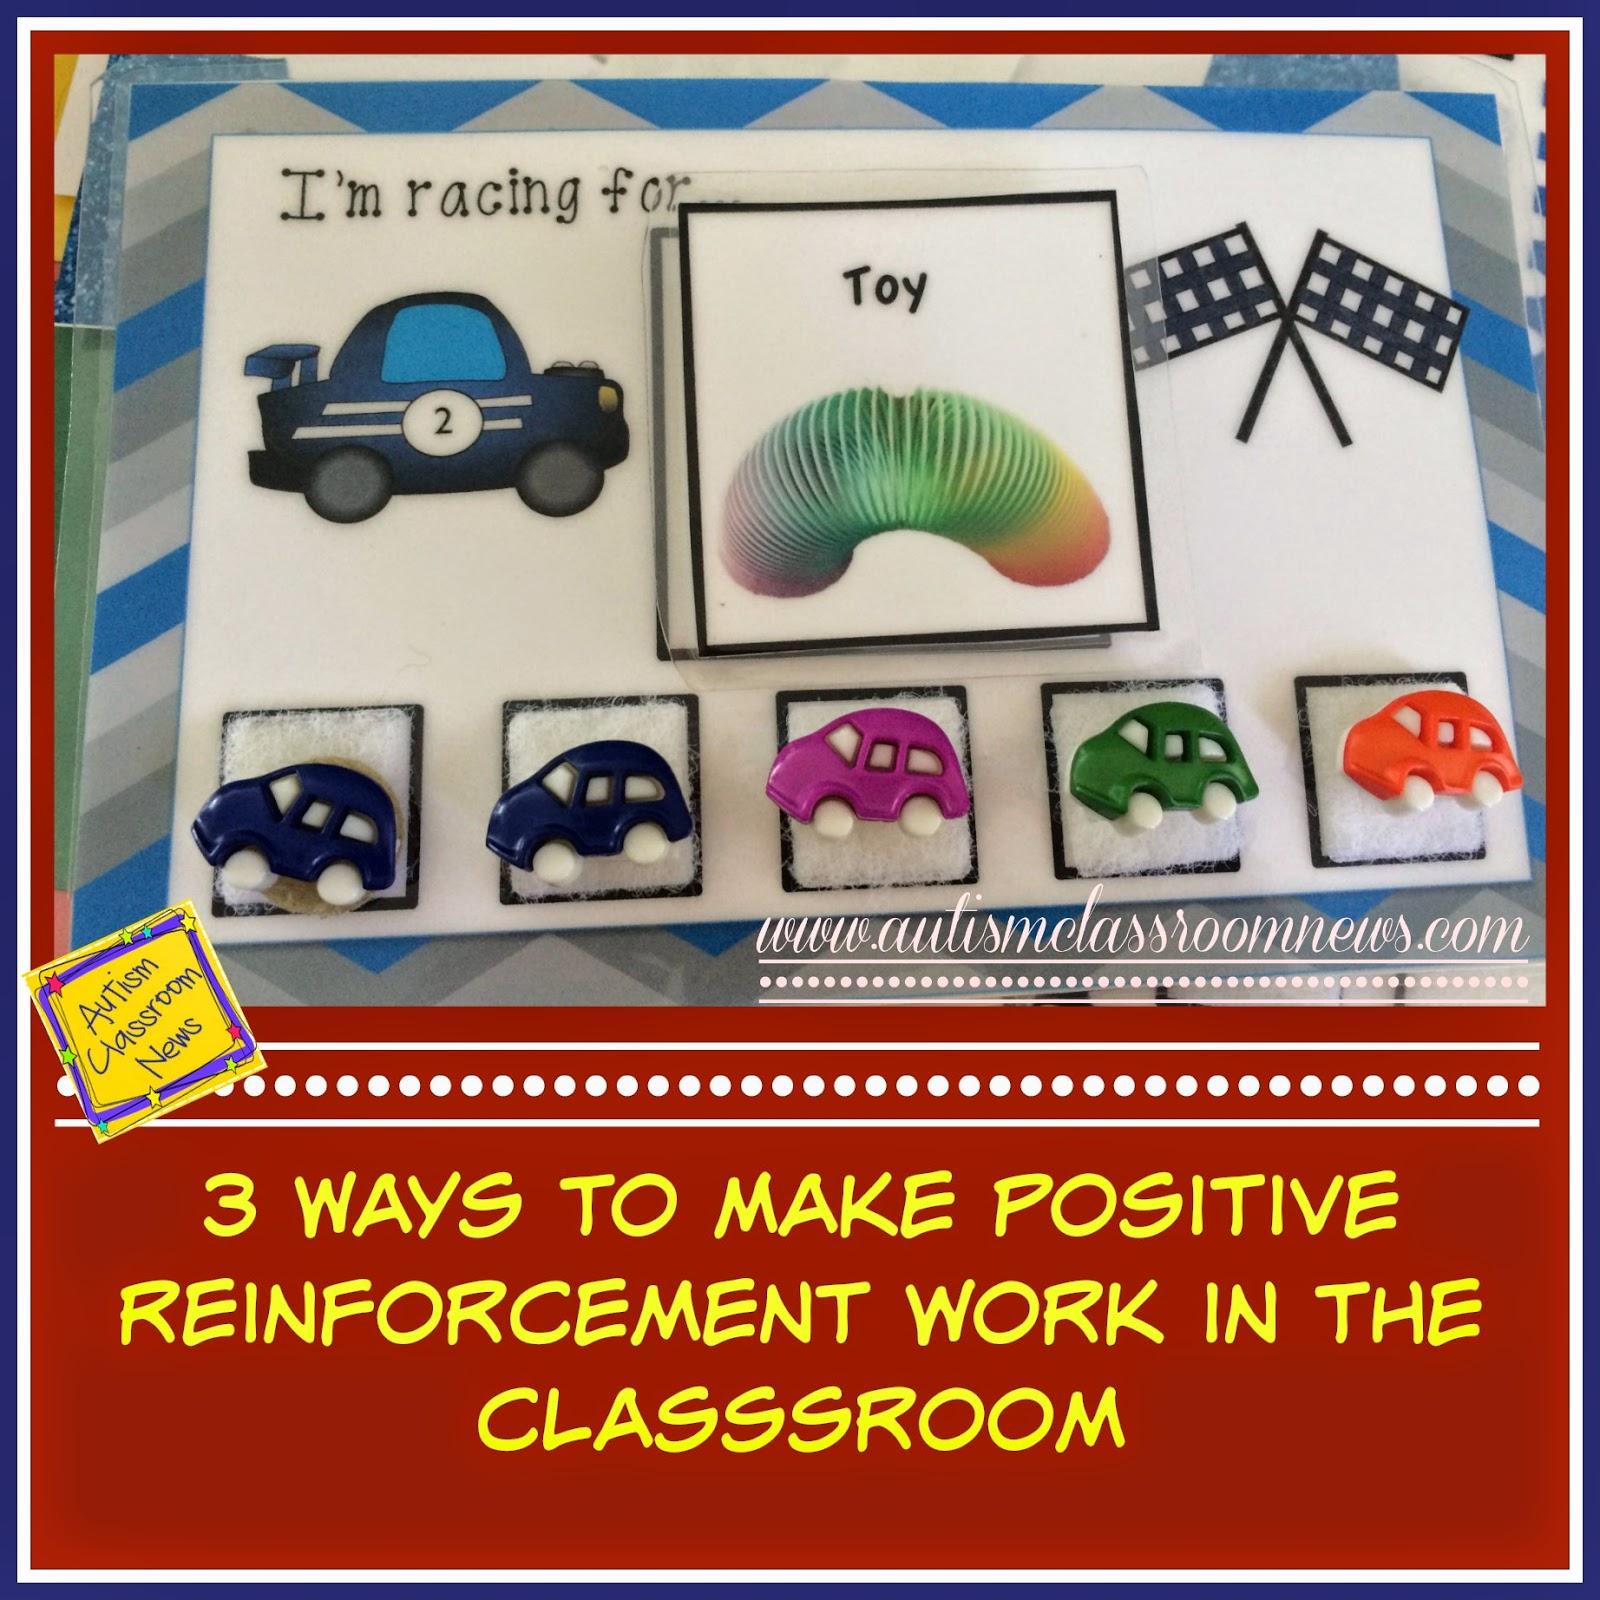 autism classroom news 3 ways to make positive